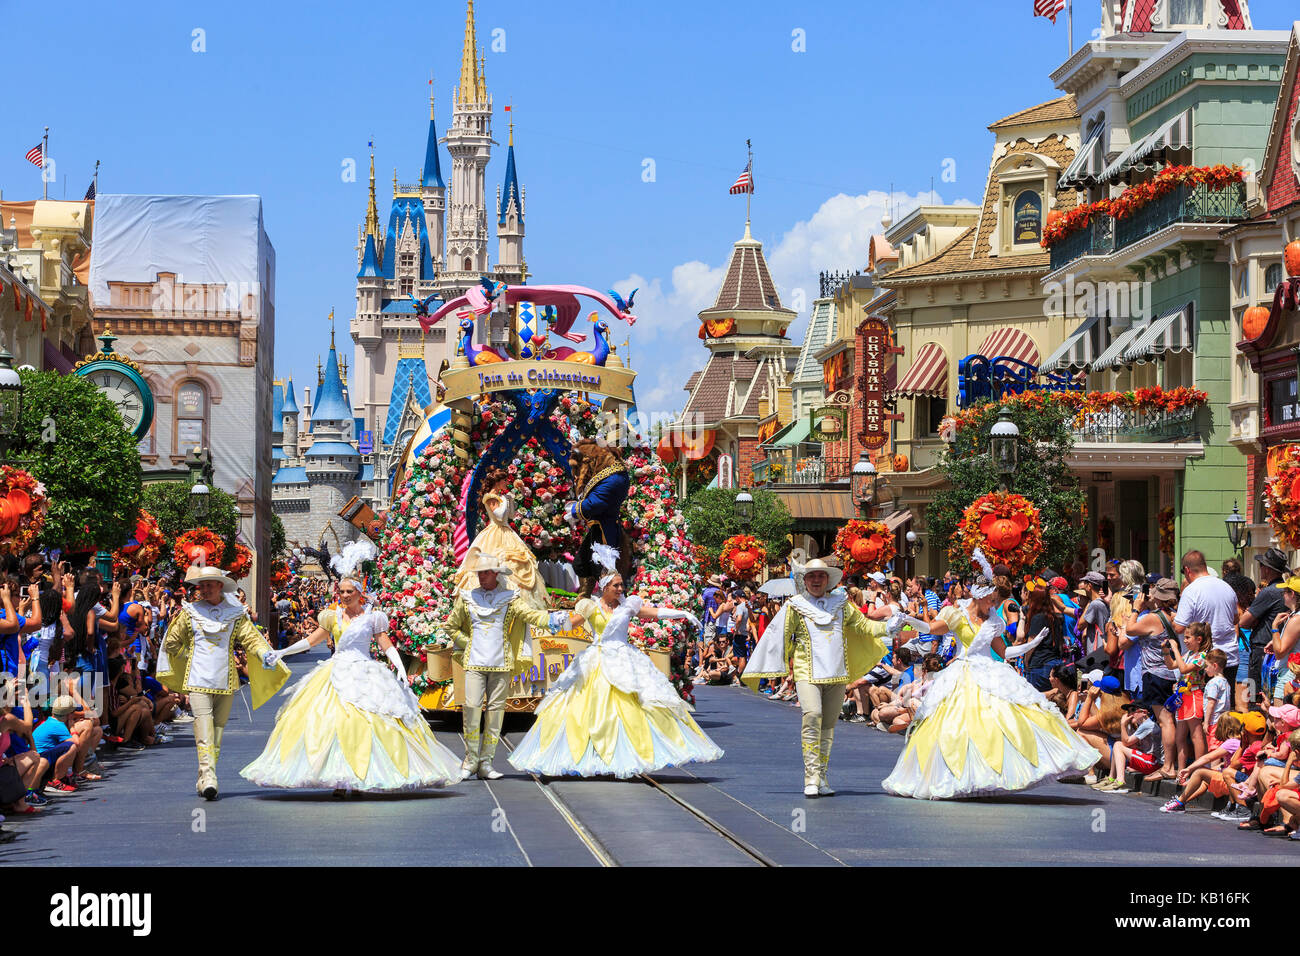 Walt Disney's Magic Kingdom theme park, showing the fairy tale castle, Orlando, Florida, USA and the fairy tale - Stock Image